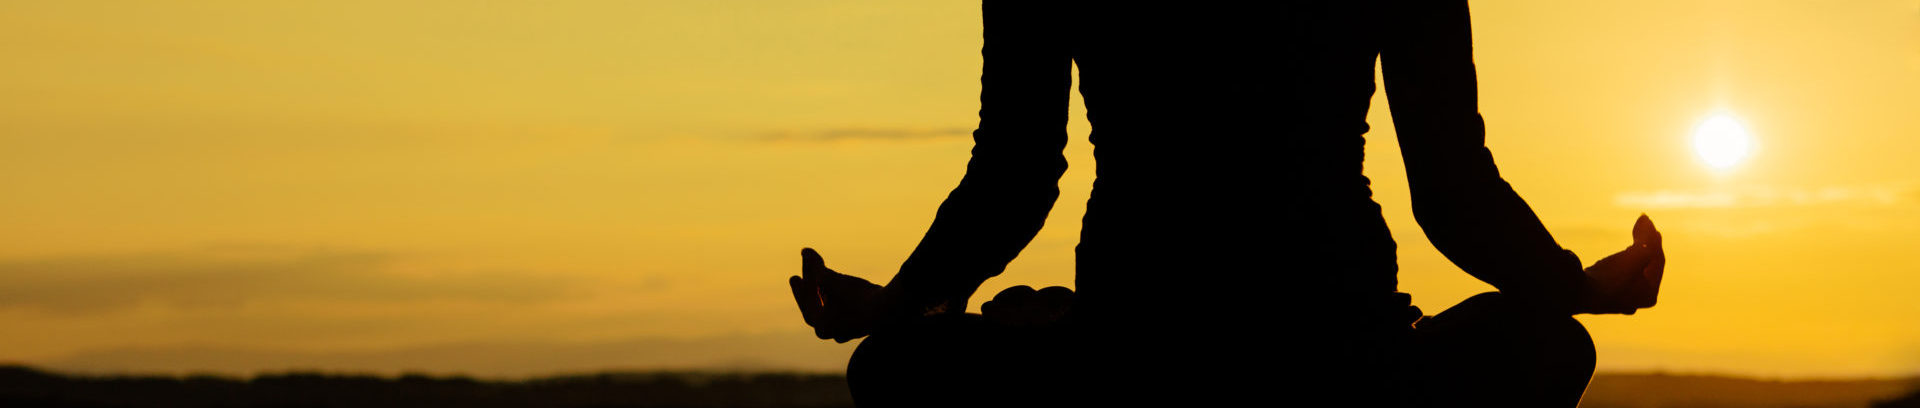 eva-maria yoga sitz sonnenuntergang